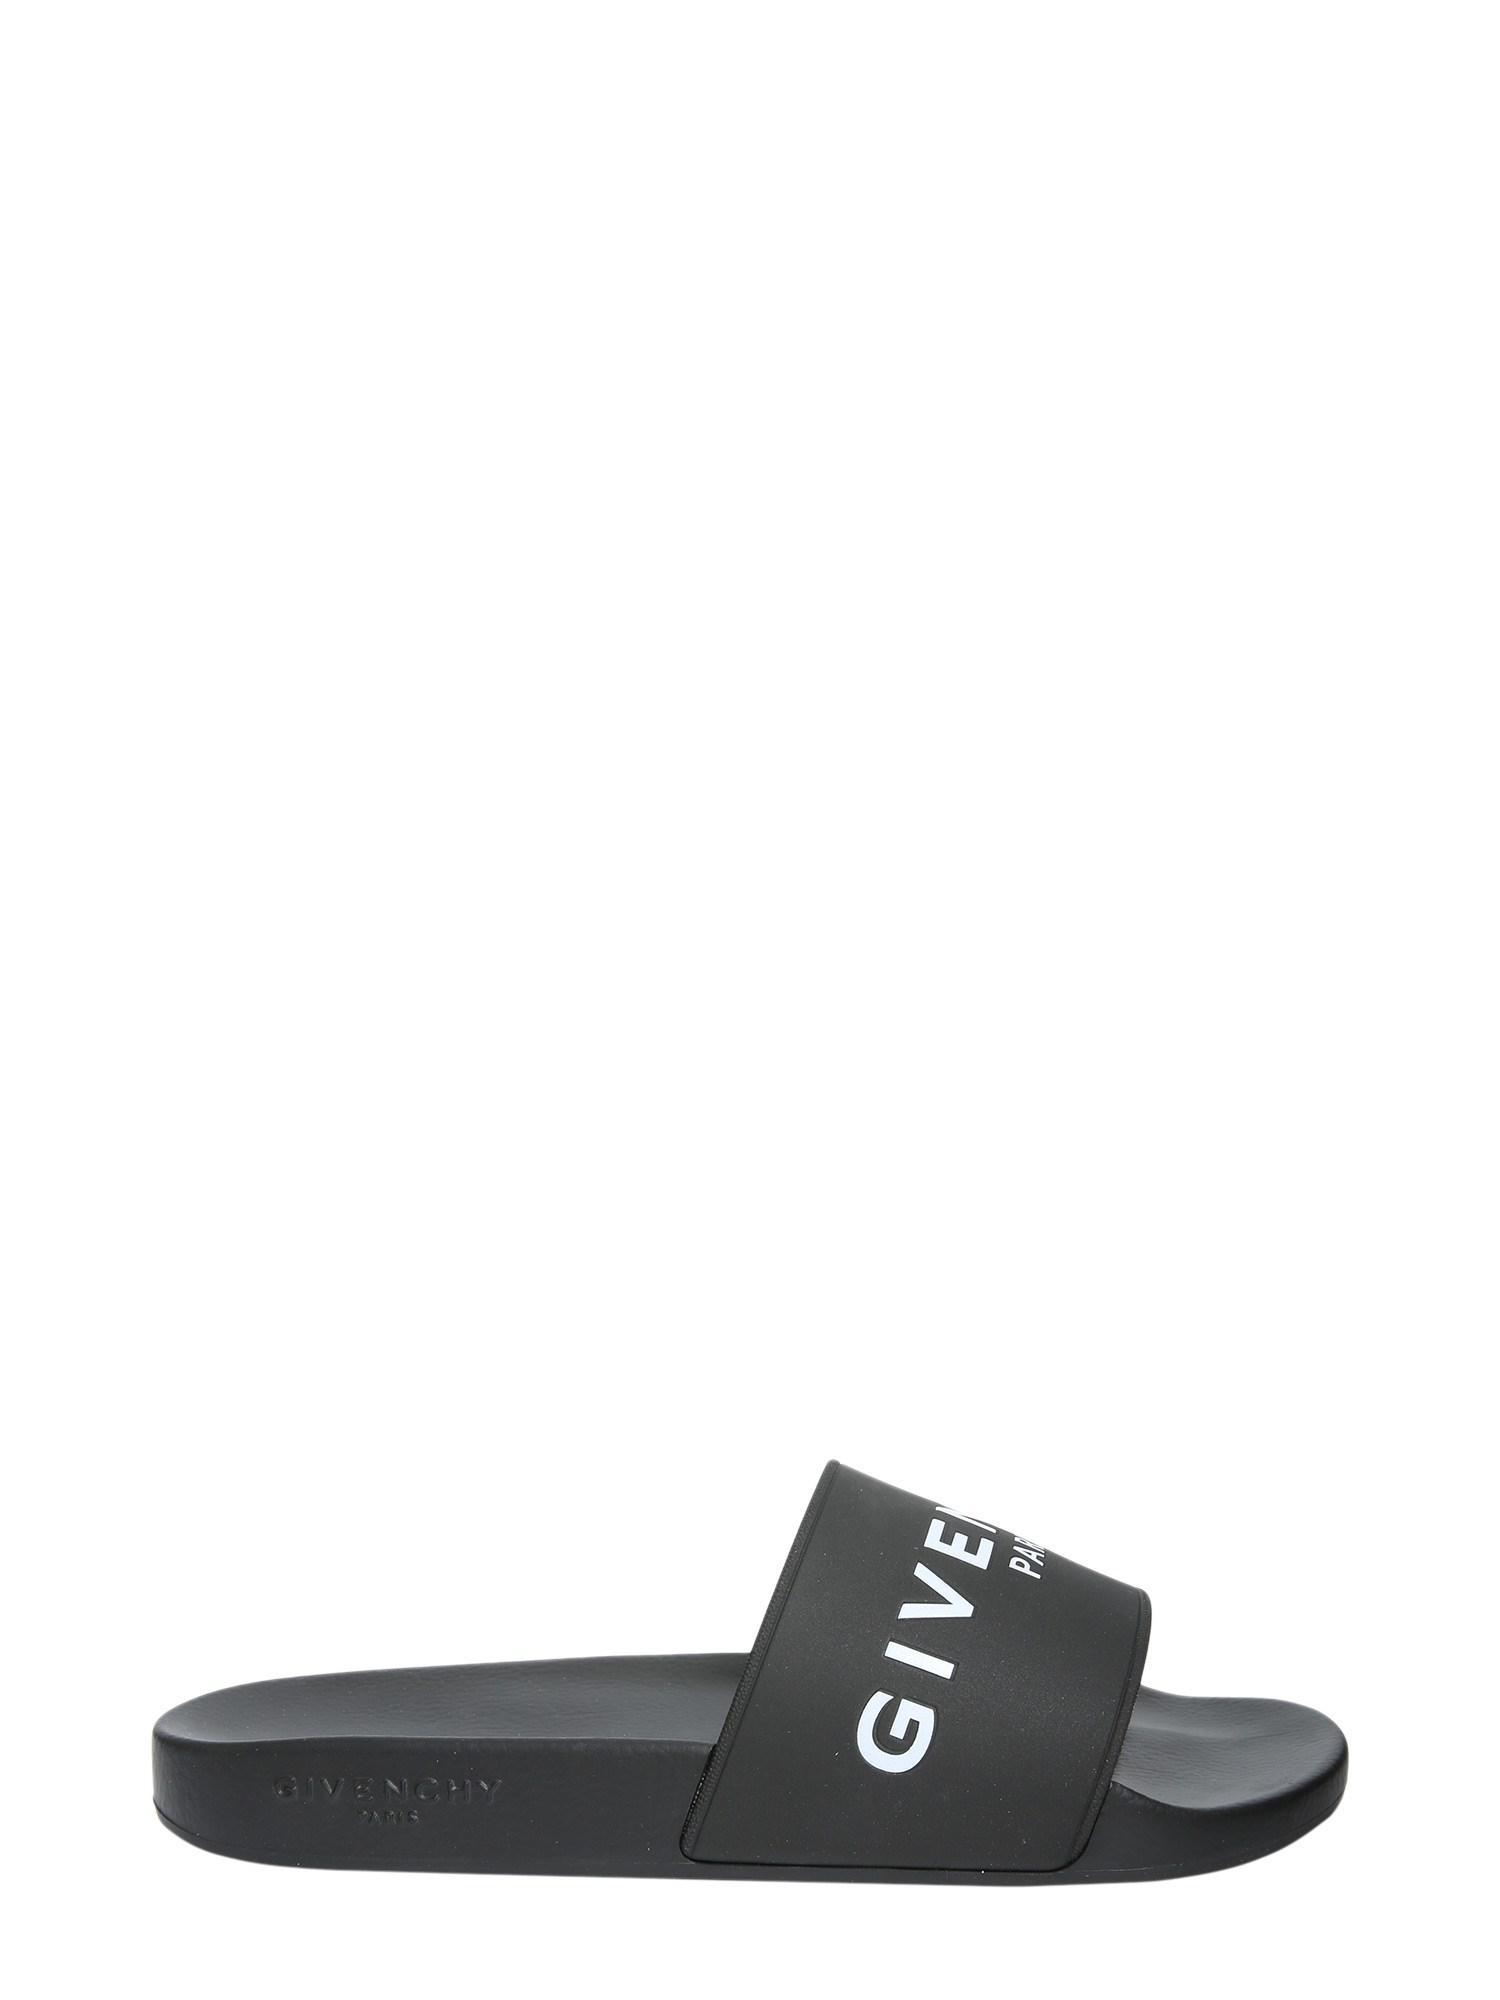 6d260c68541e Lyst - Givenchy Sandalo Slide In Gomma Con Logo in Black for Men ...